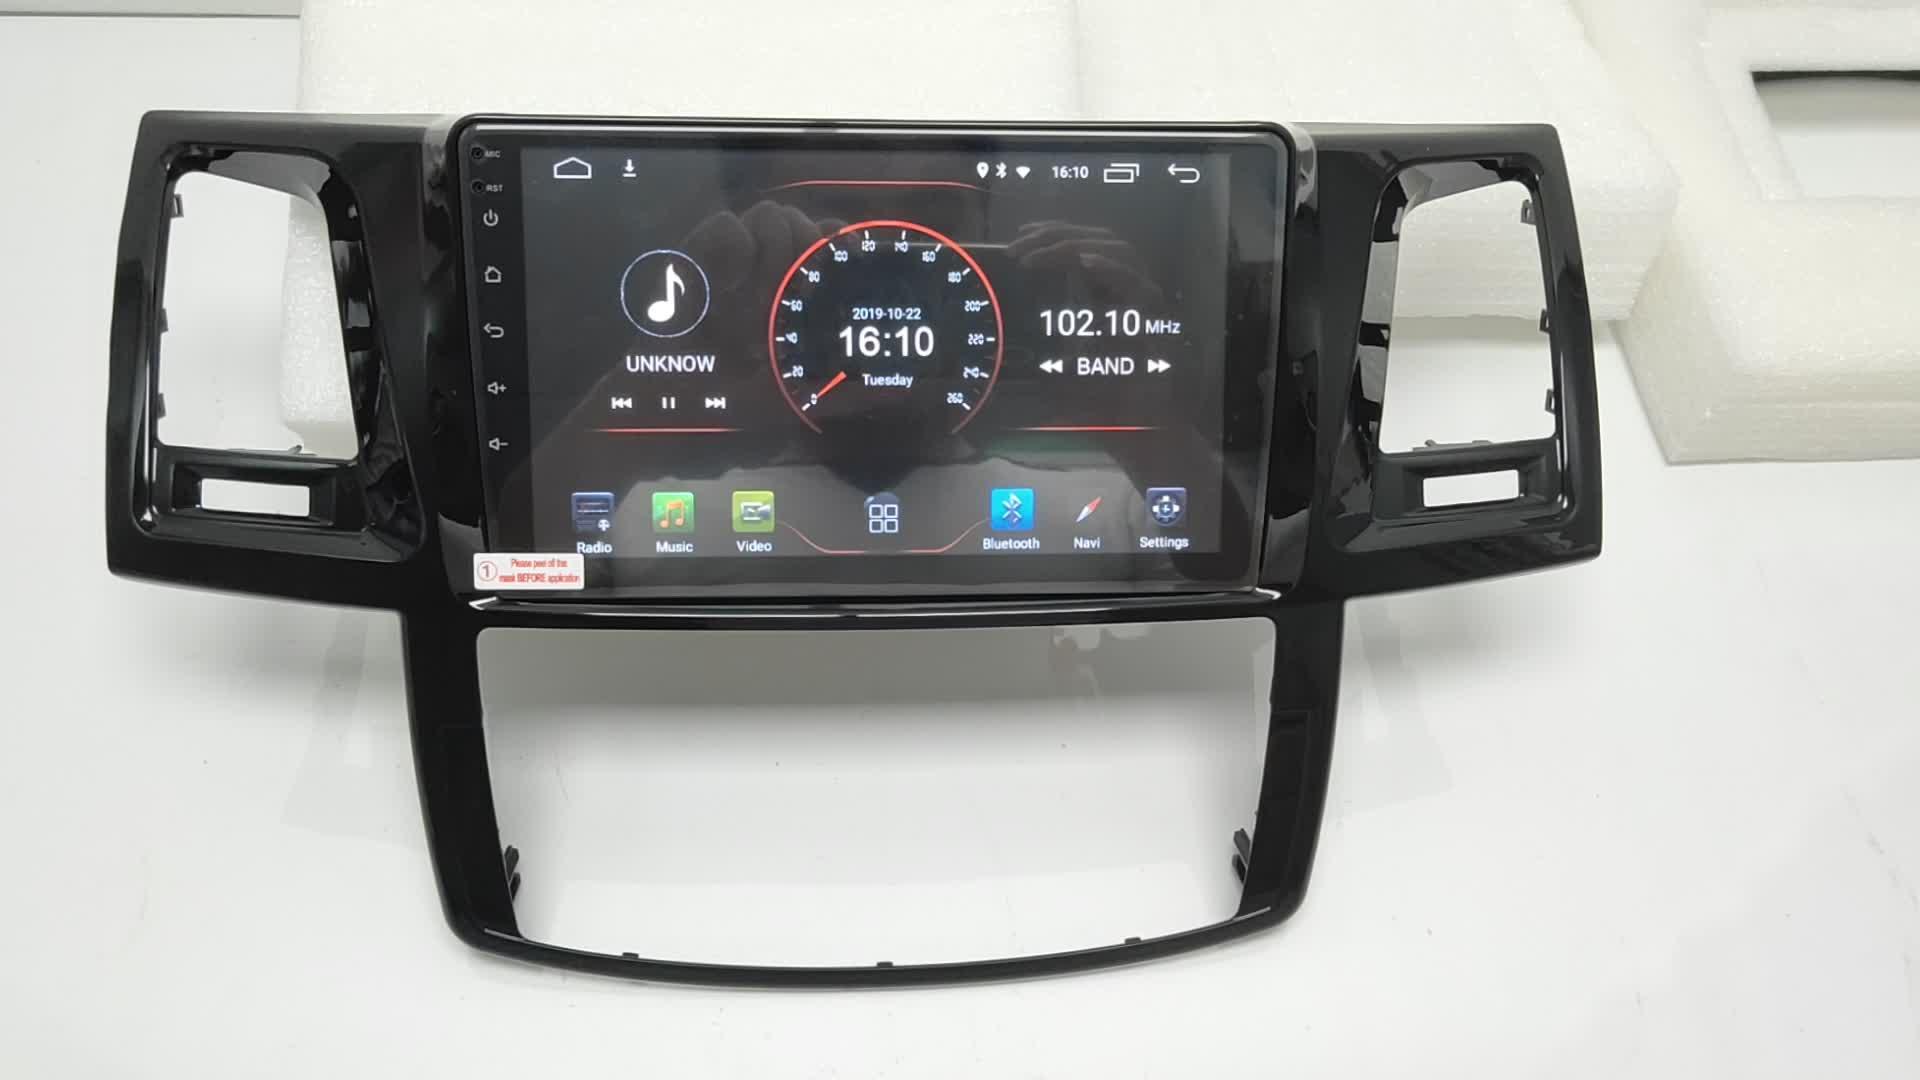 Newnavi アンドロイド 9.0 1 喧騒車のラジオ 10.1 インチのフルタッチスクリーン車のビデオプレーヤーのためのトヨタハイラックス 2012